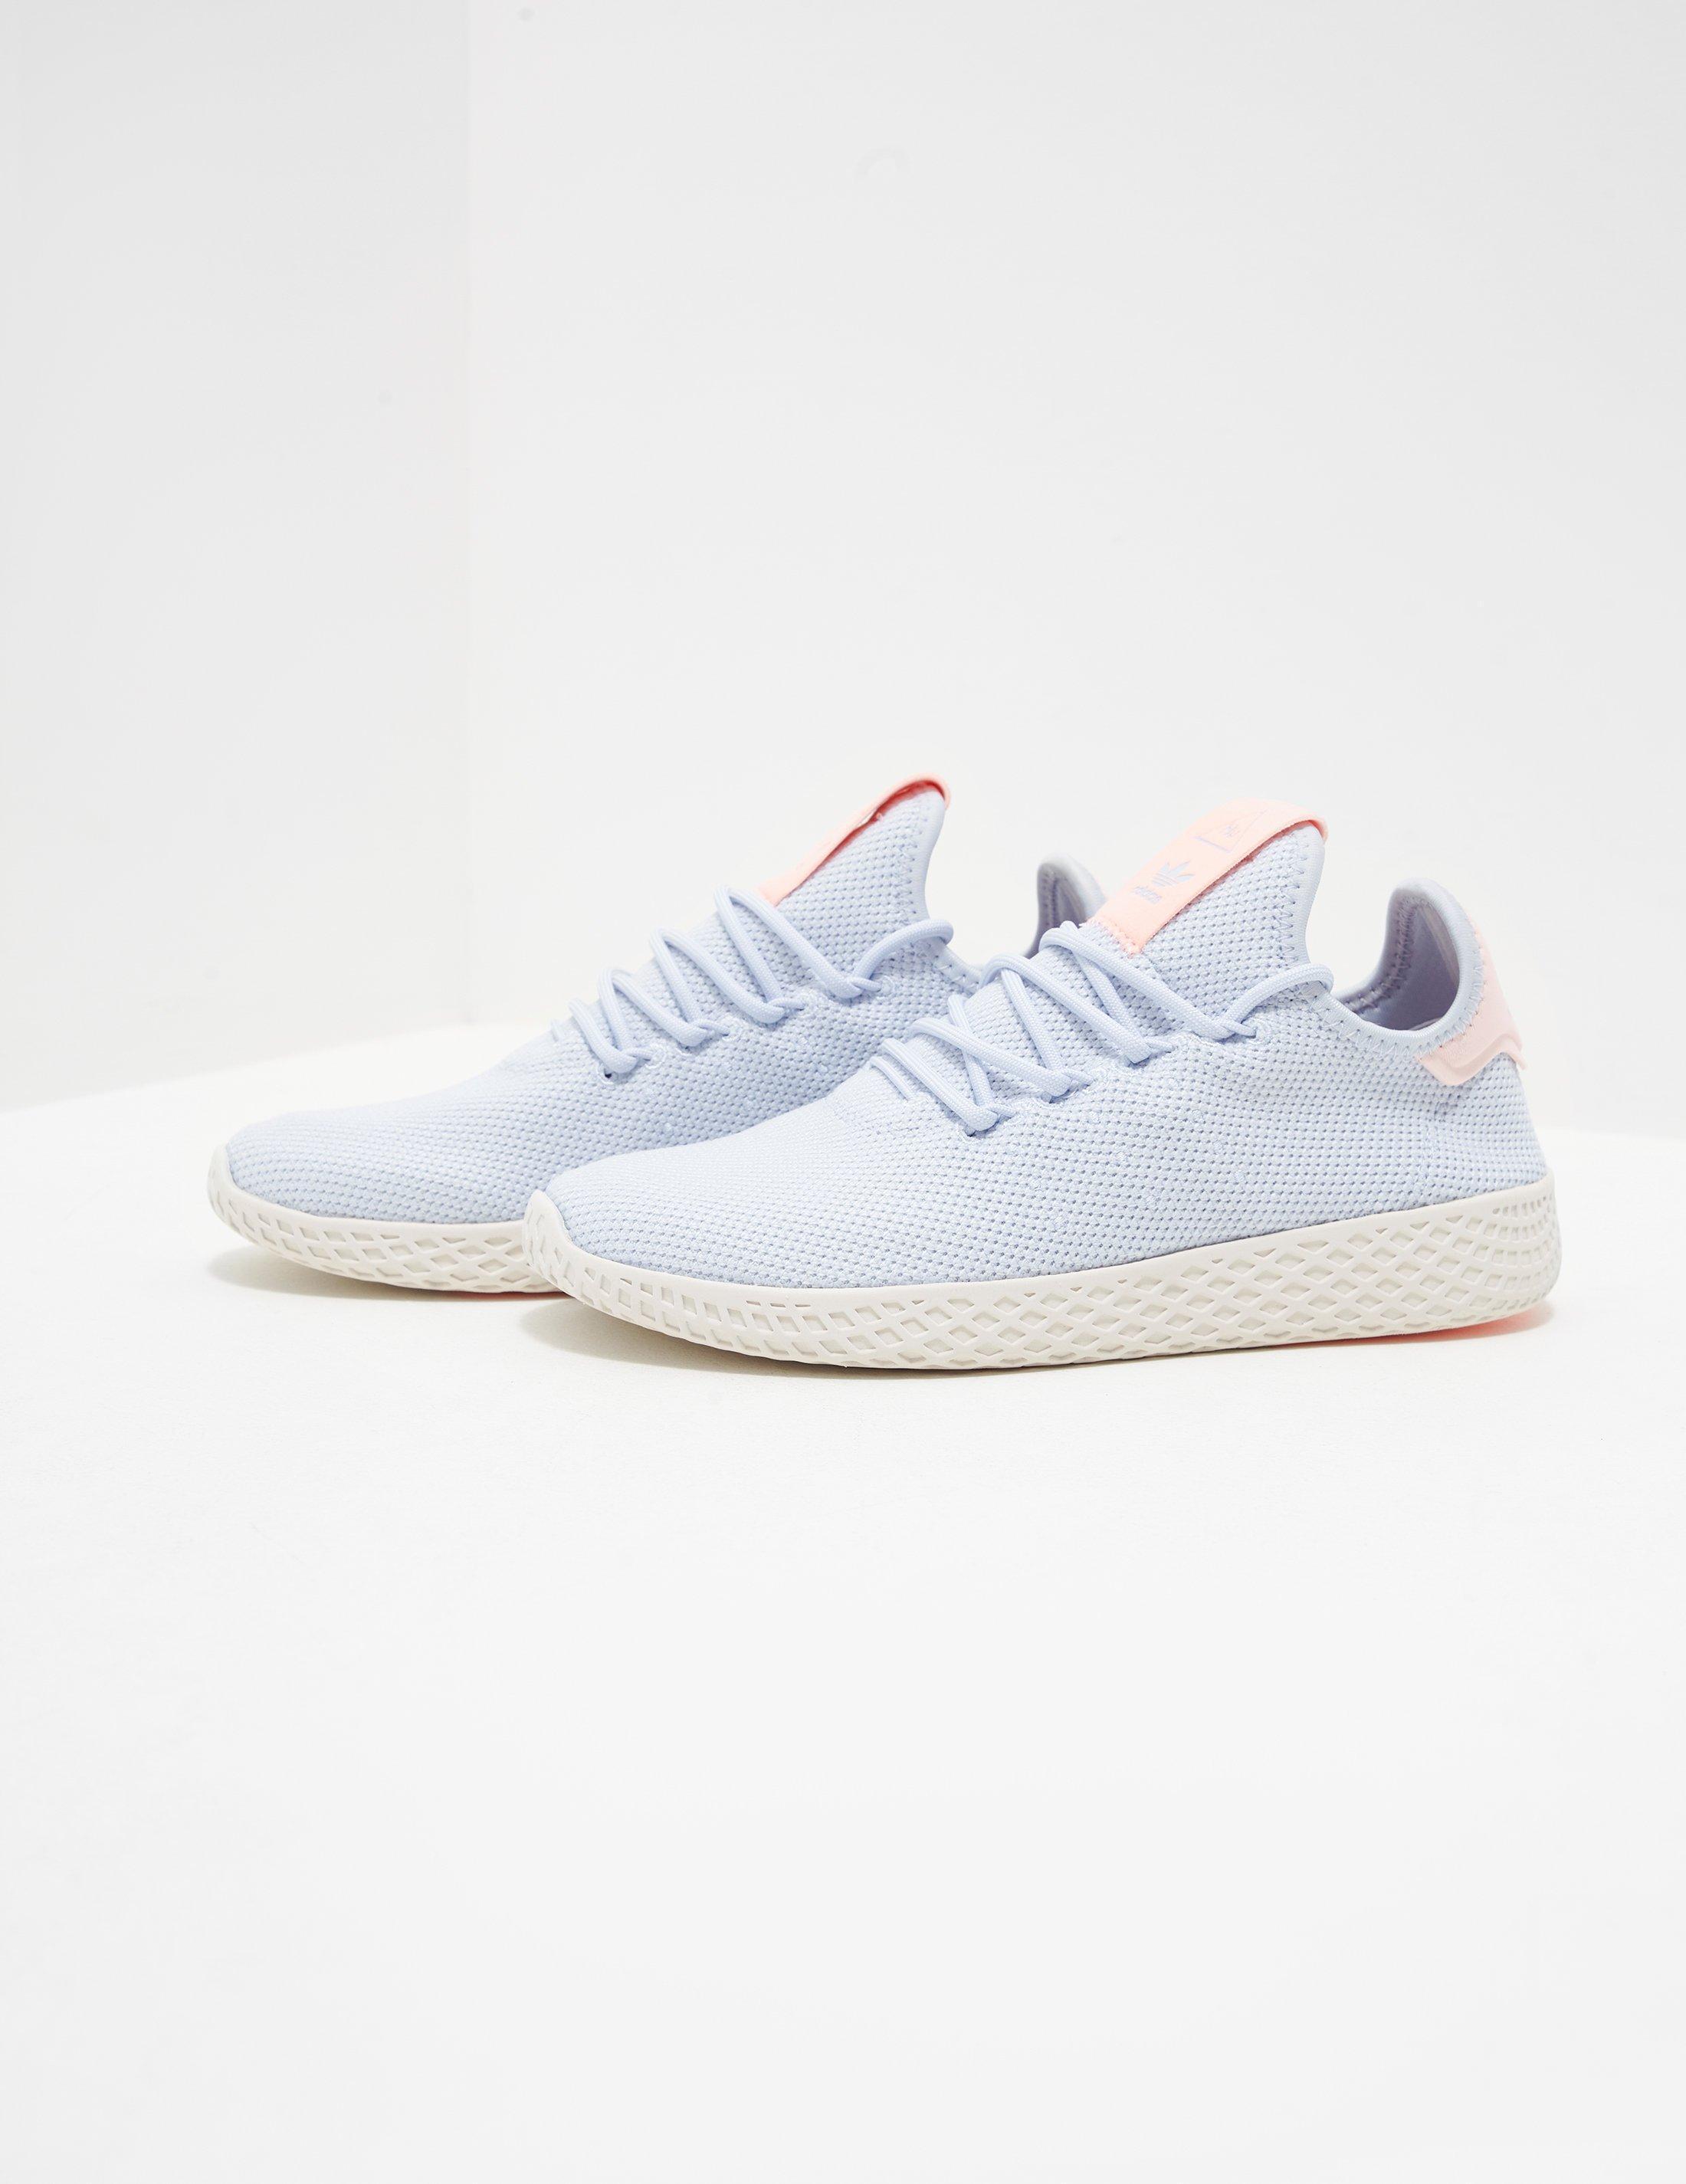 0c81afc76 adidas Originals X Pharrell Williams Tennis Hu Trainers Blue in Blue ...